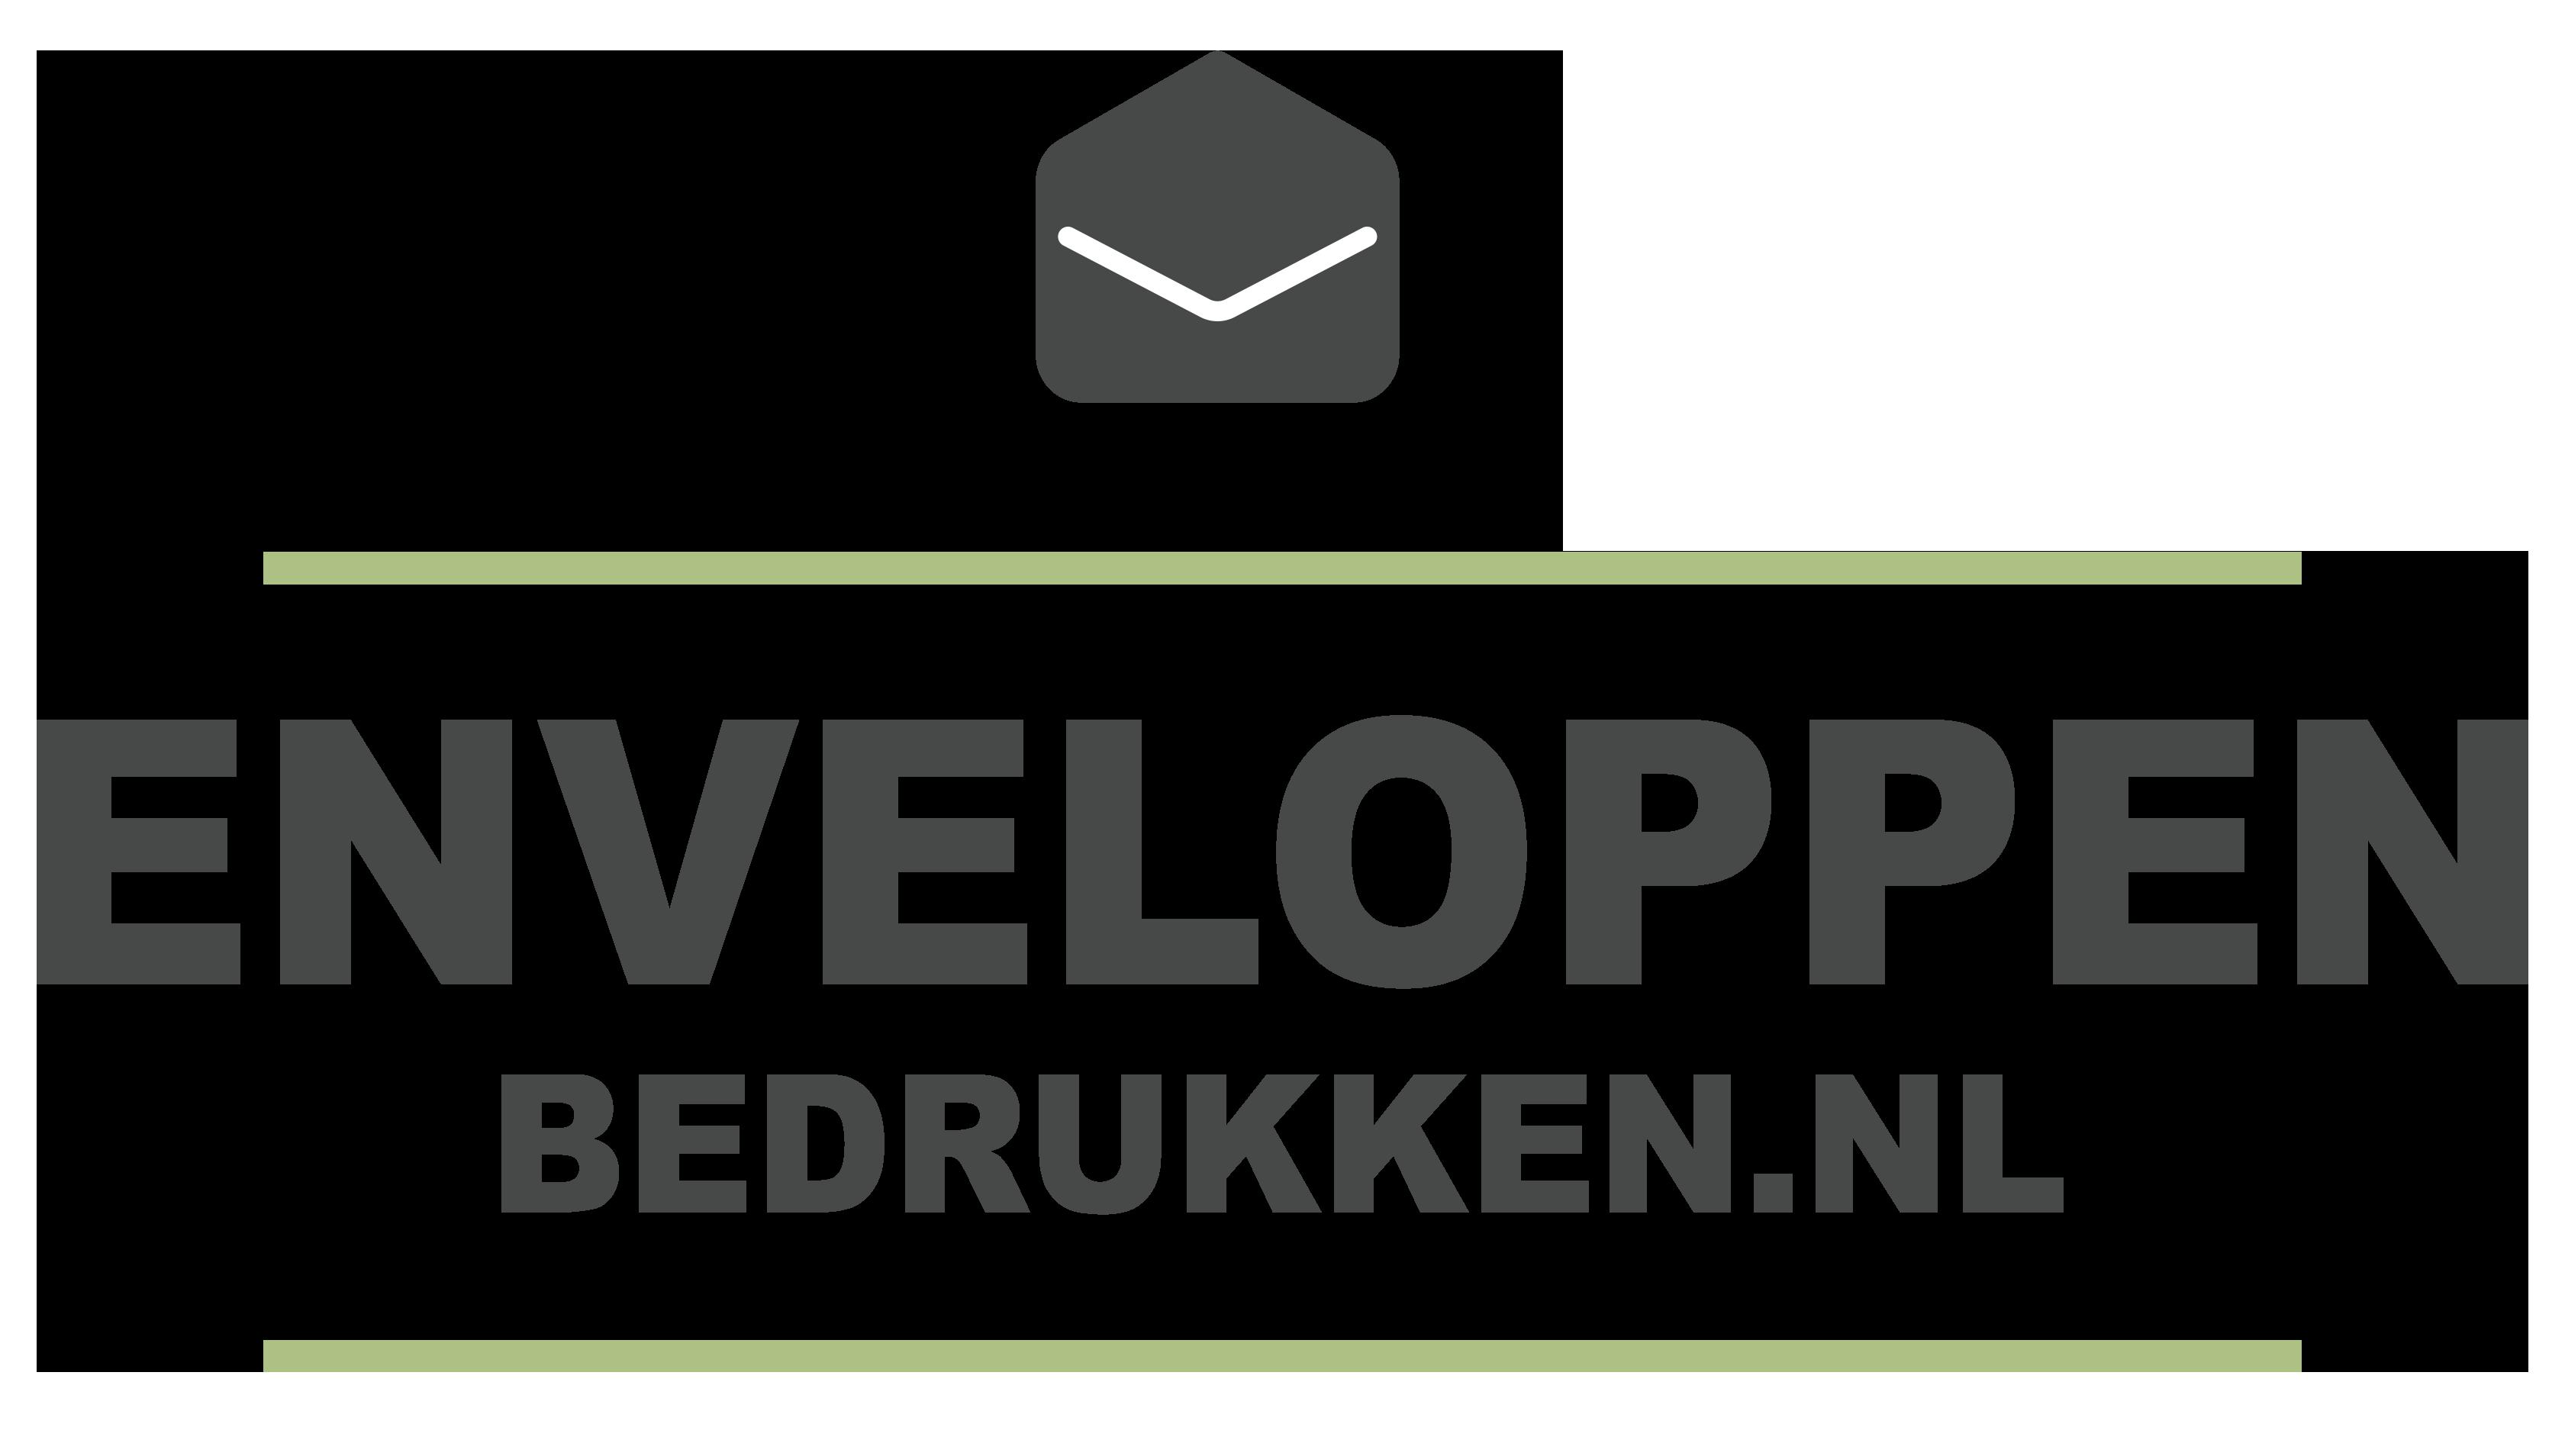 Enveloppenbedrukken.nl - Enveloppen bedrukken vanaf 1 stuk